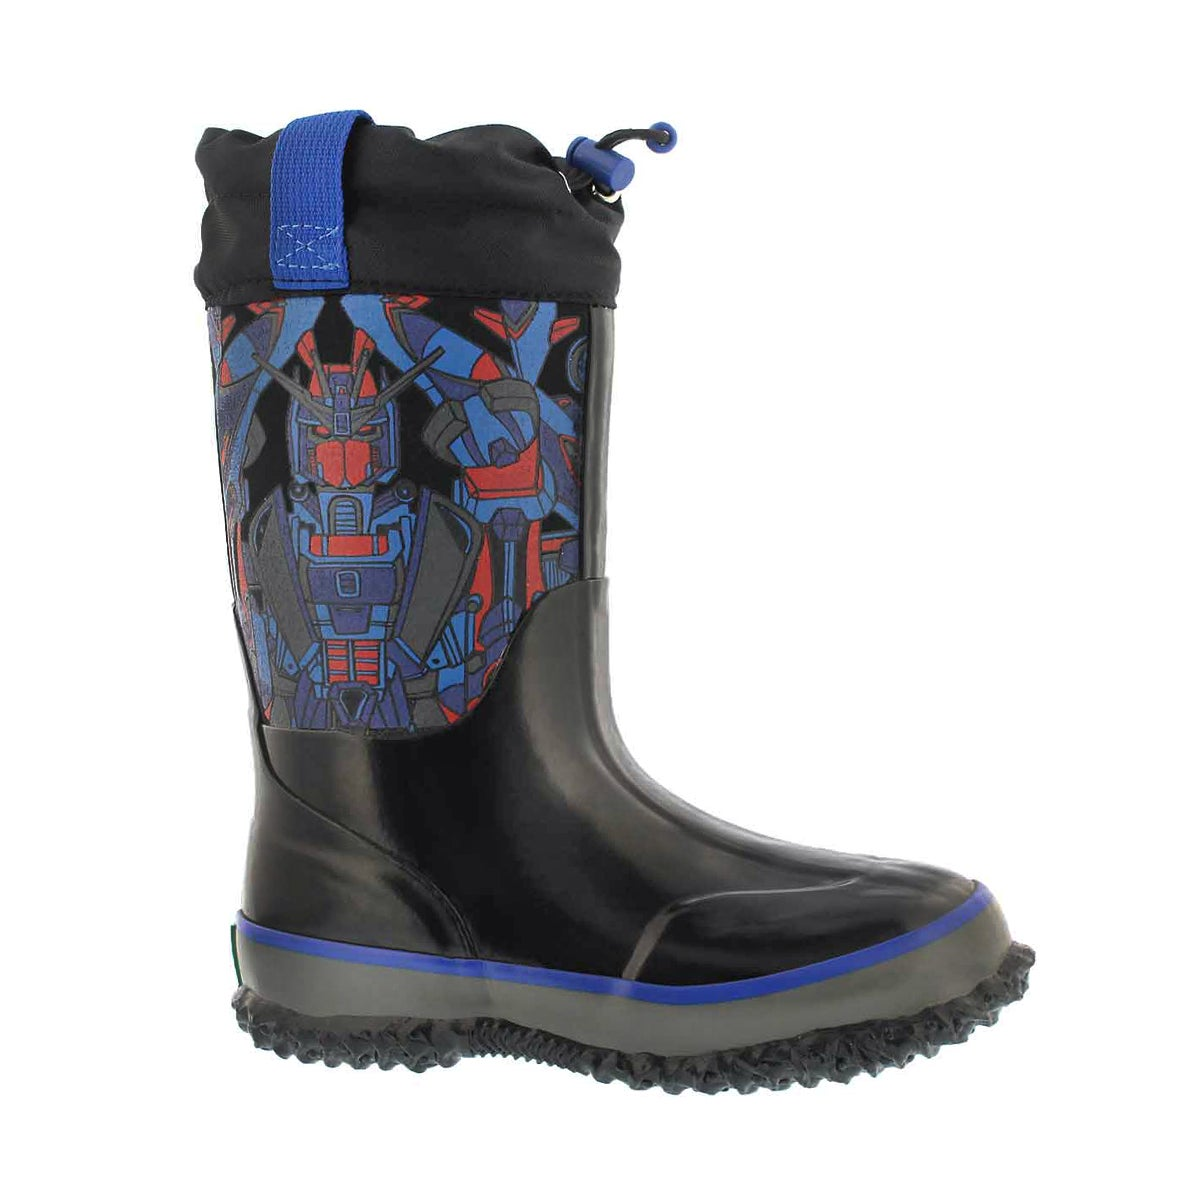 Boys' ROBOTRON black wtpf pull on winter boots